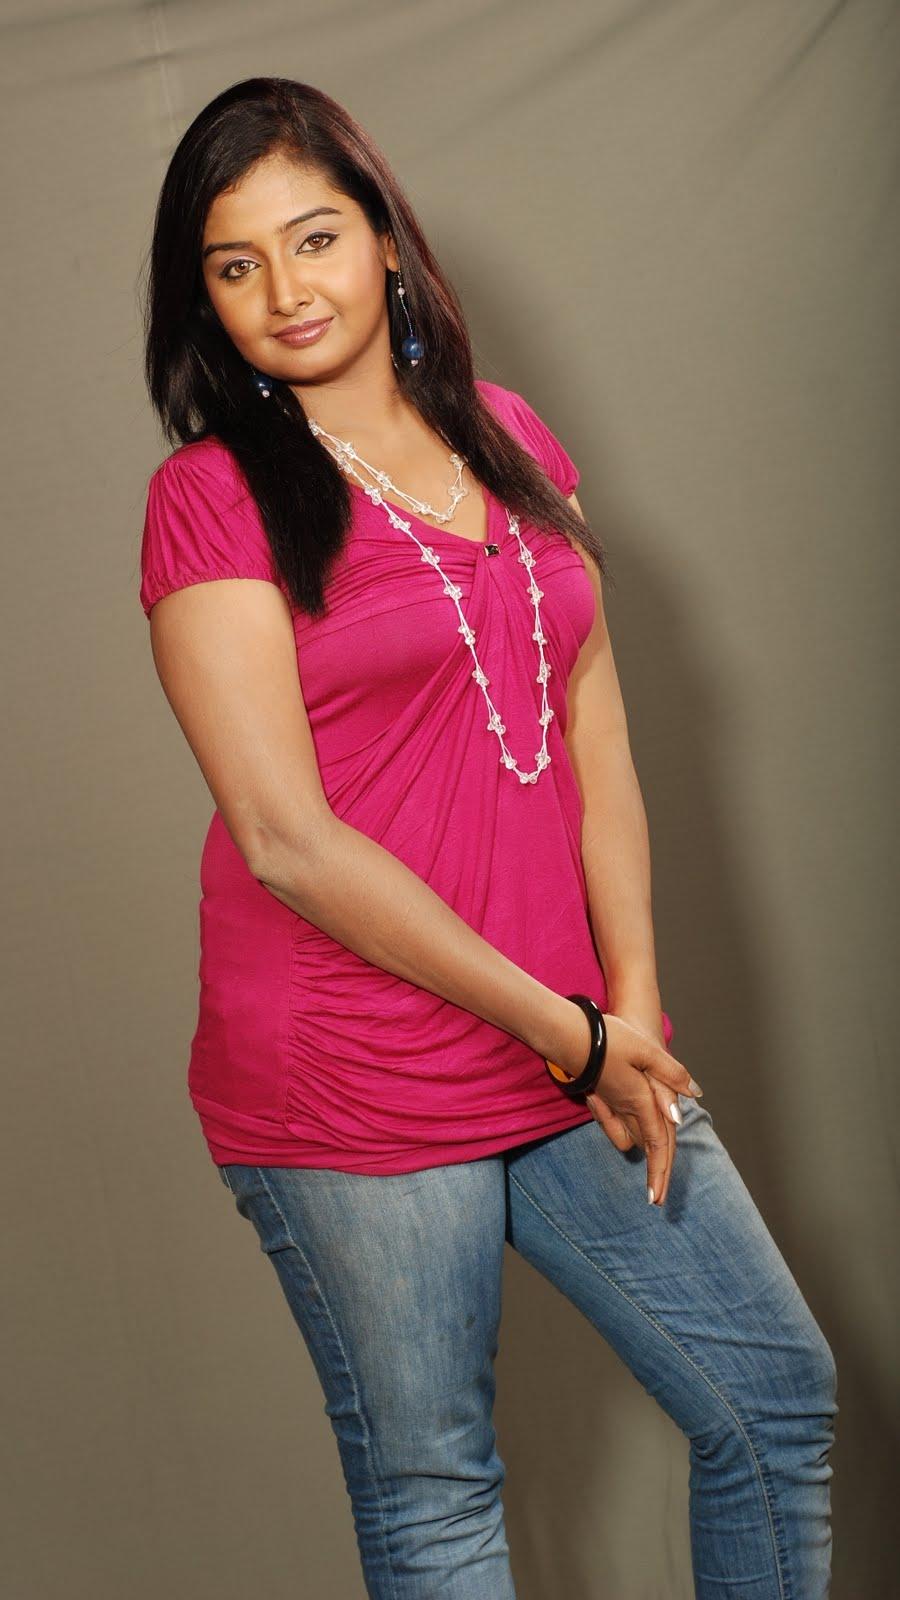 Zee telugu tv live serials